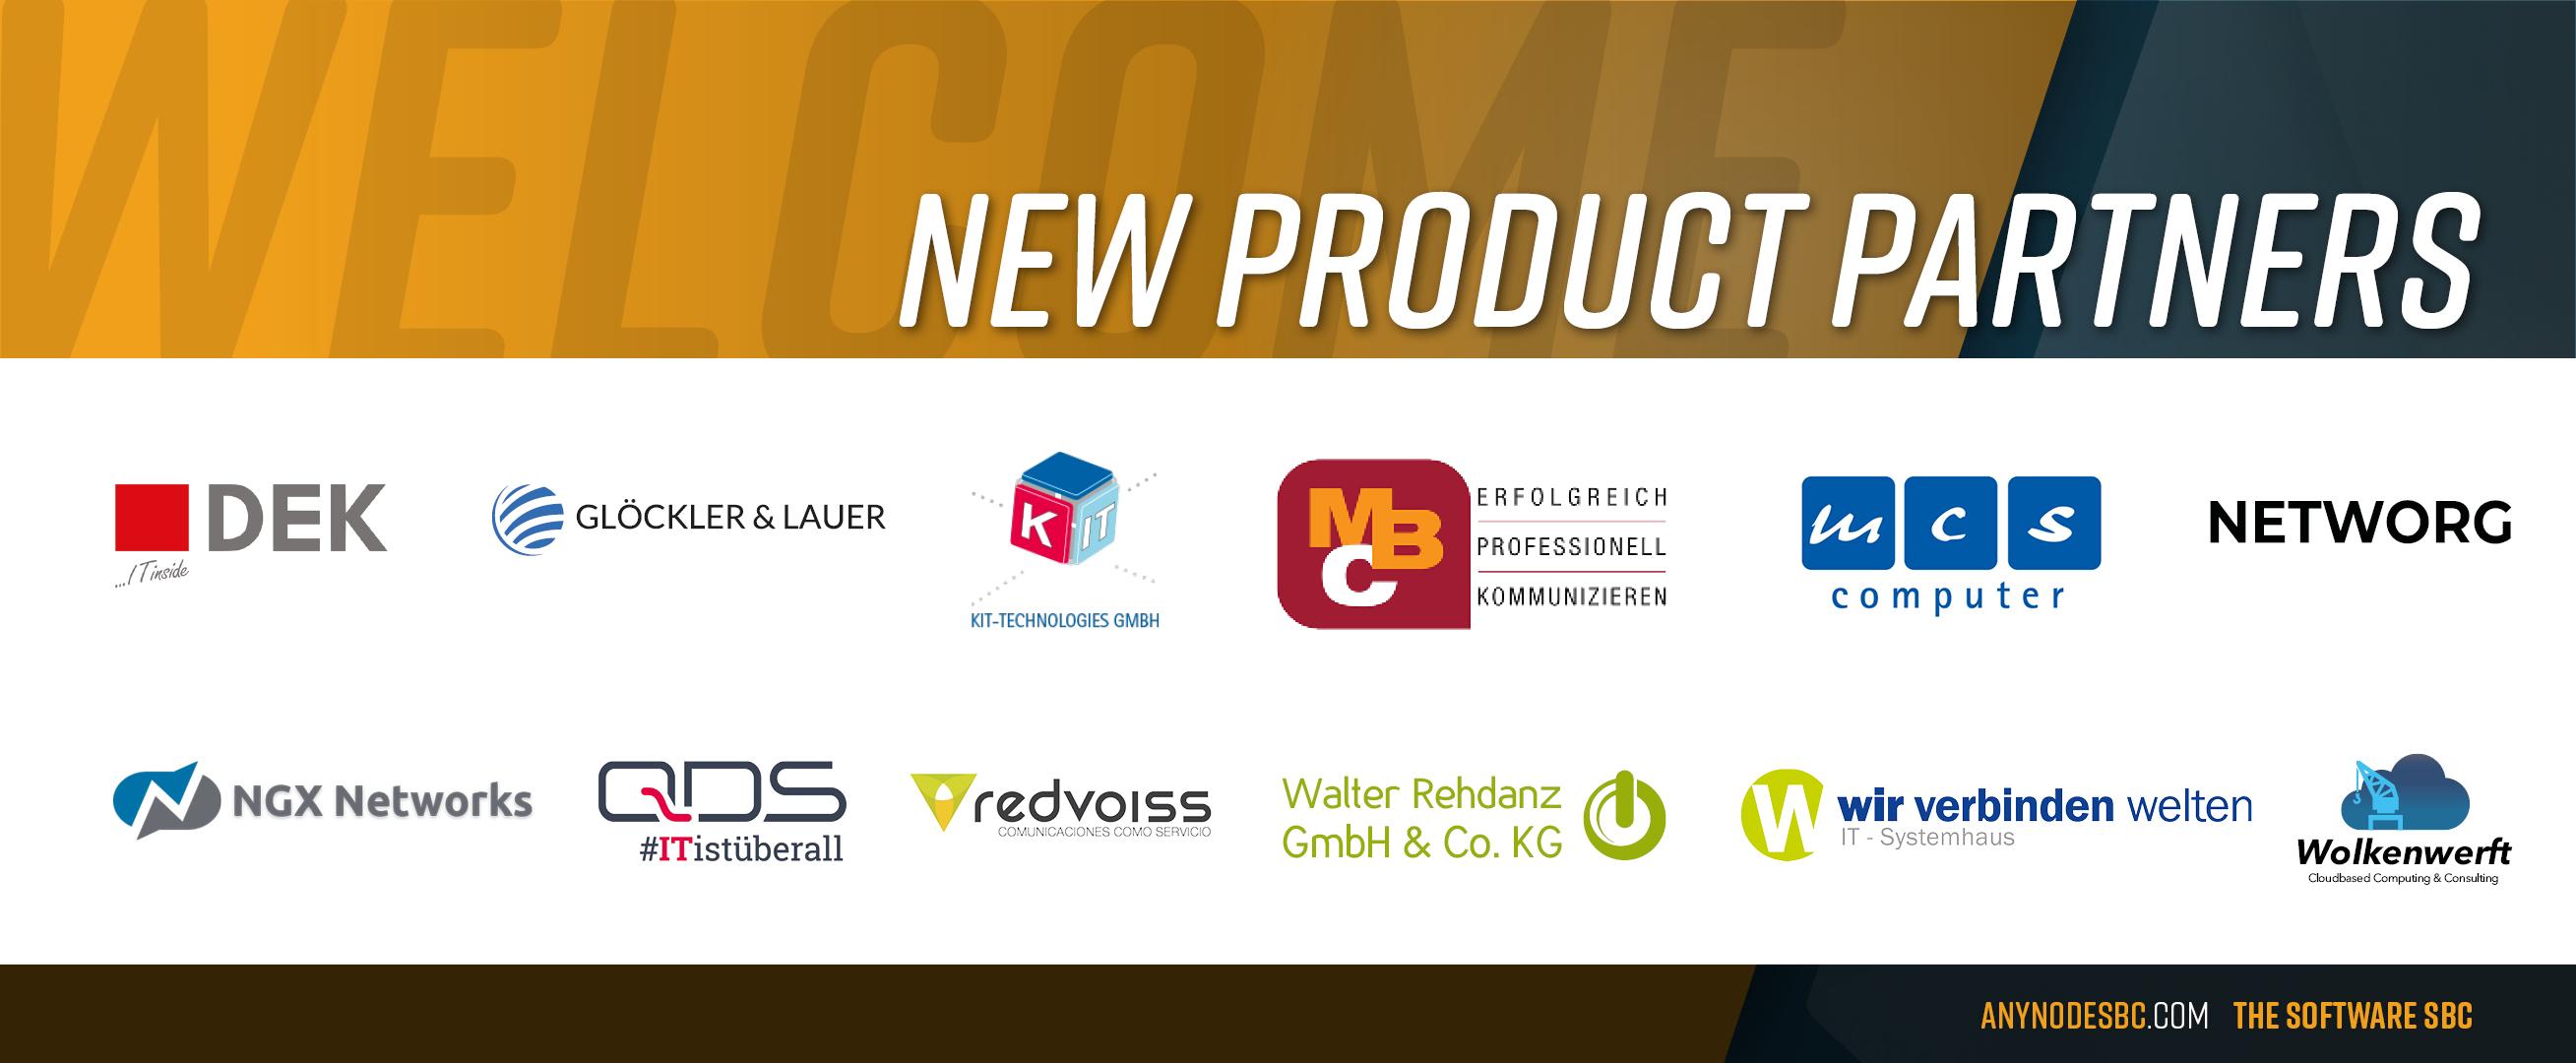 Neue anynode Produktpartner im November 2020!